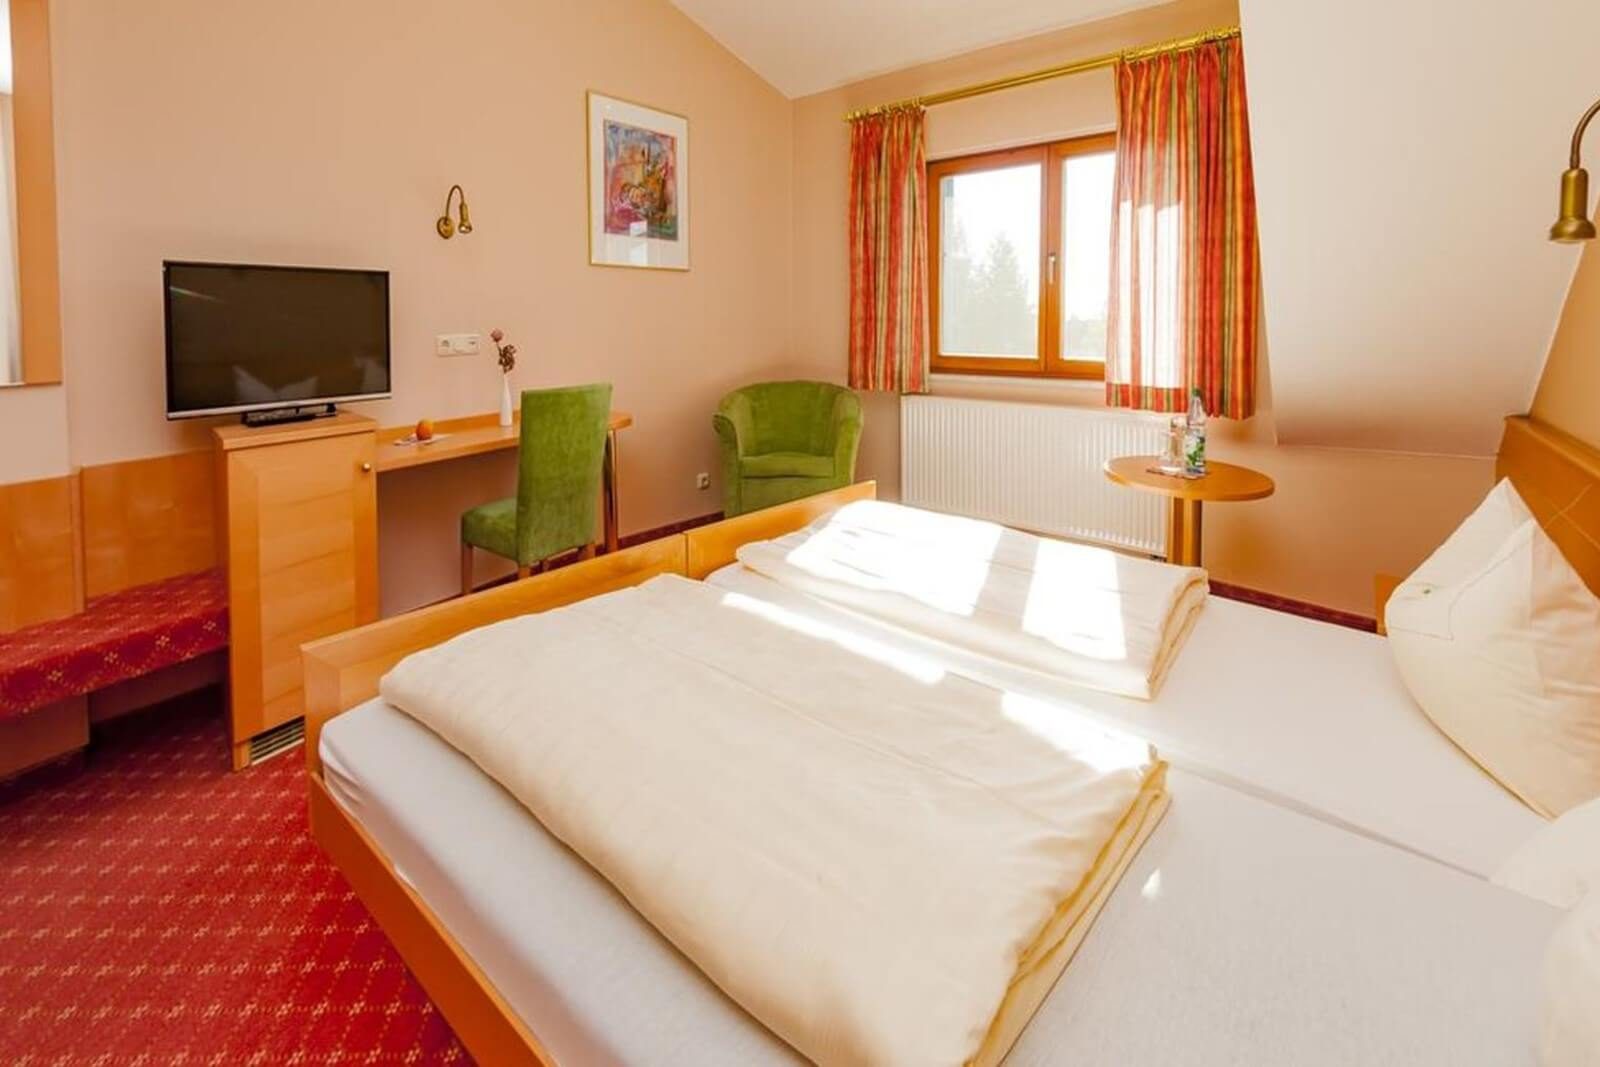 einzelzimmer-komfort-hotel-pension-bett-fruehstueck-riedstadt3